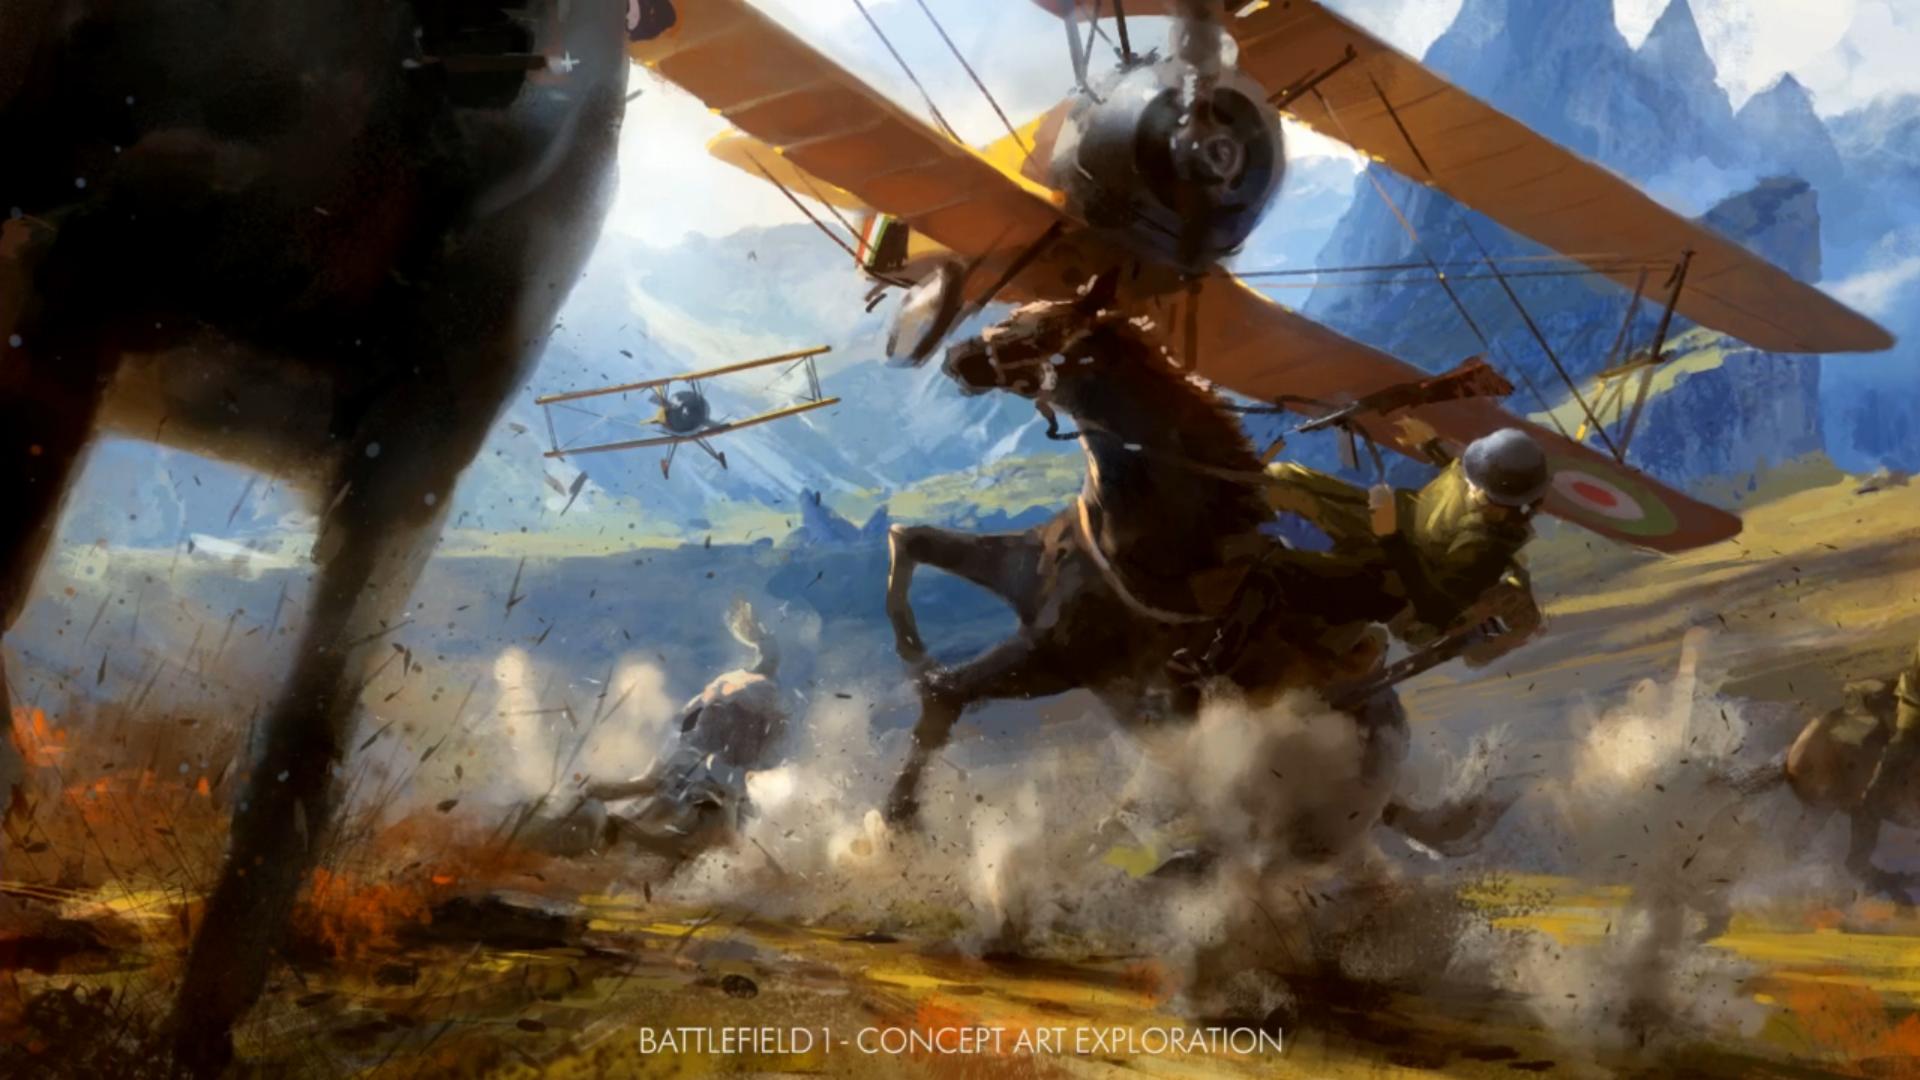 General 1920x1080 Battlefield Battlefield 1 war horse soldier video games concept art PC gaming EA Games EA DICE military aircraft aircraft